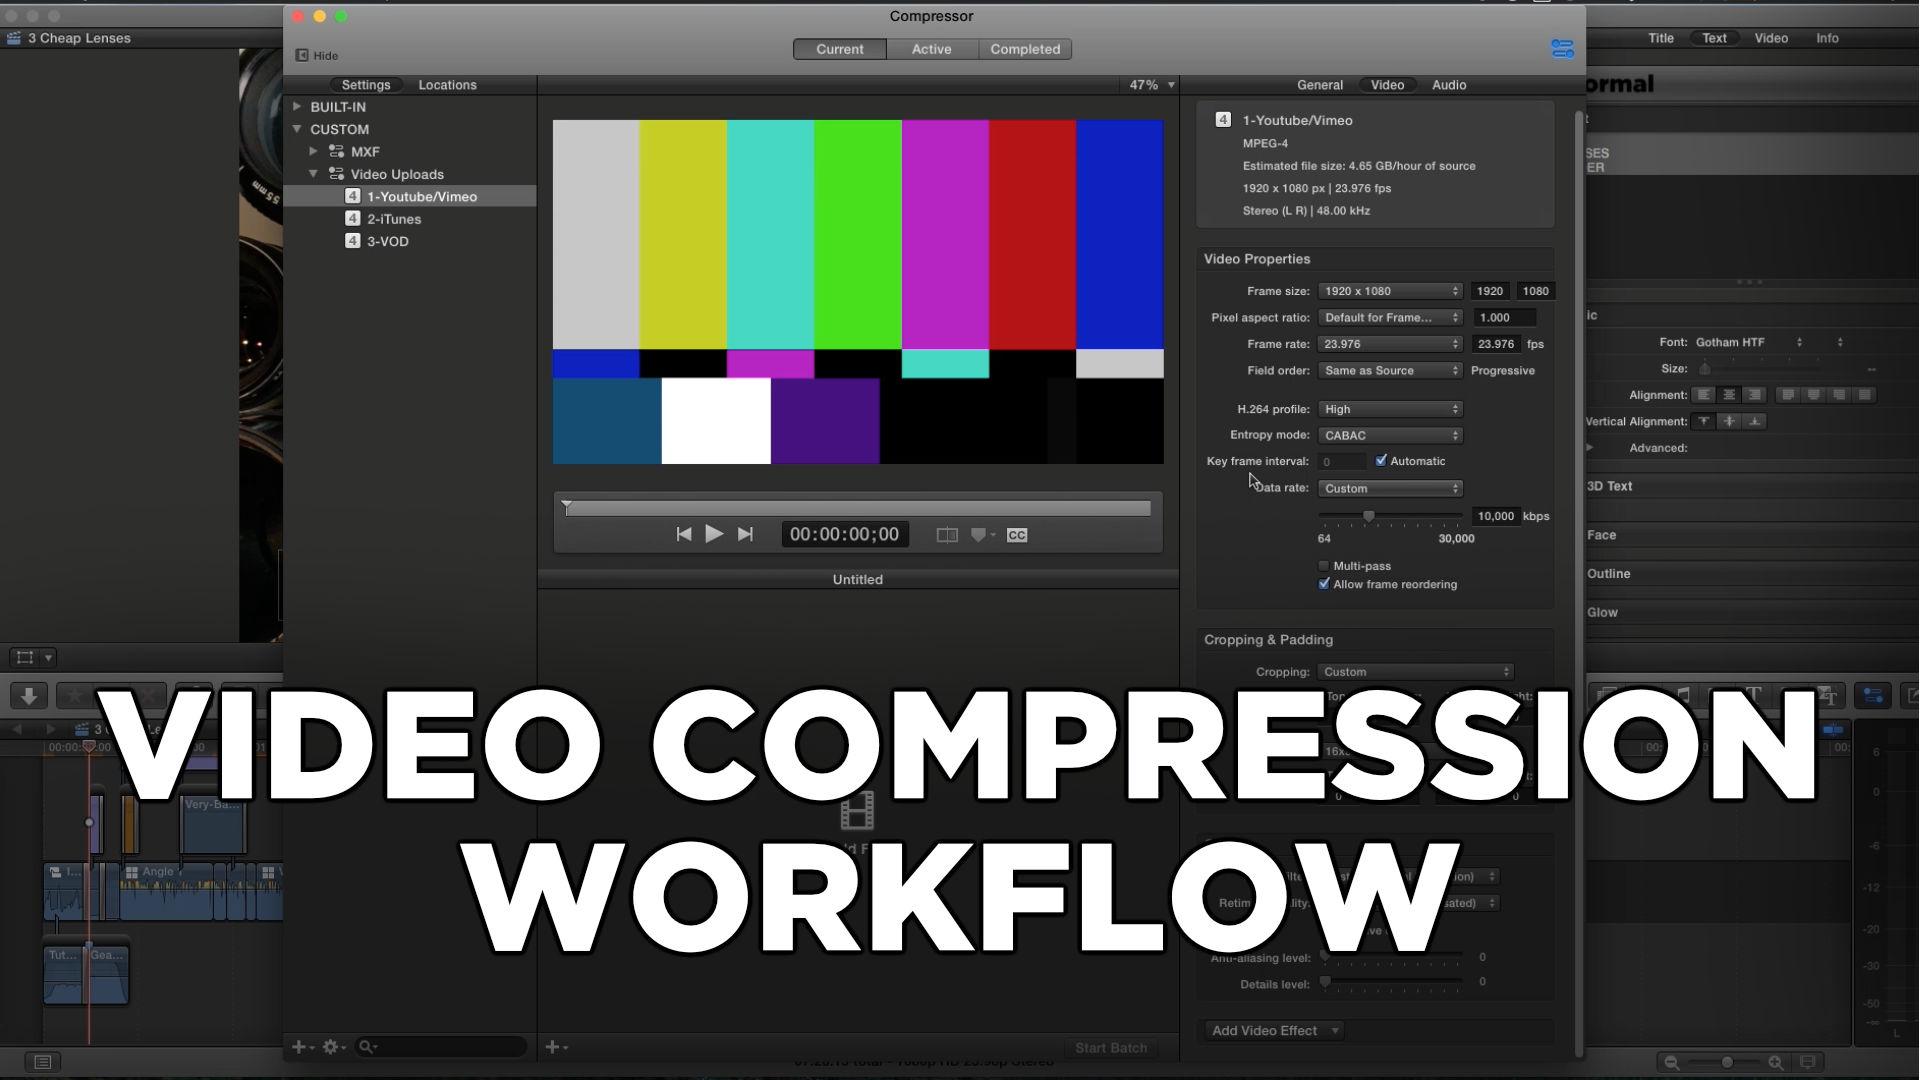 My Video Compression Workflow (FCPX + Compressor)